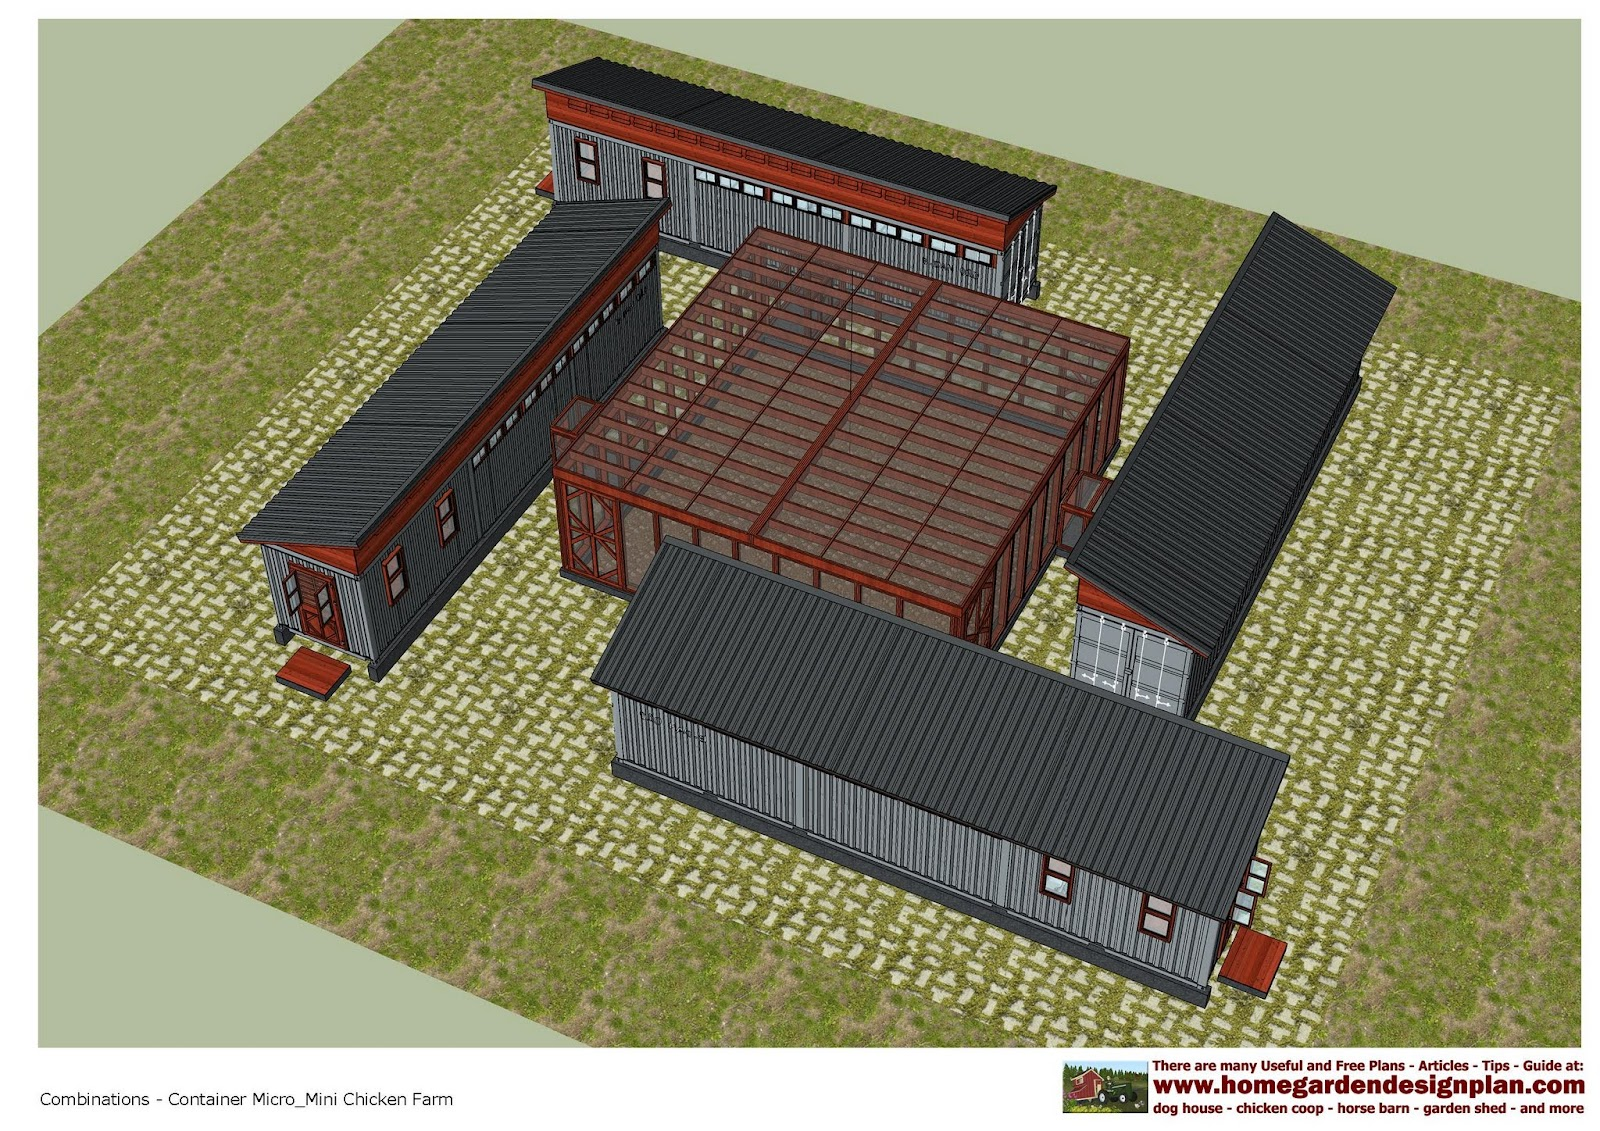 Home Garden Plans Cn200 1 40 Feet Container Chicken Farm